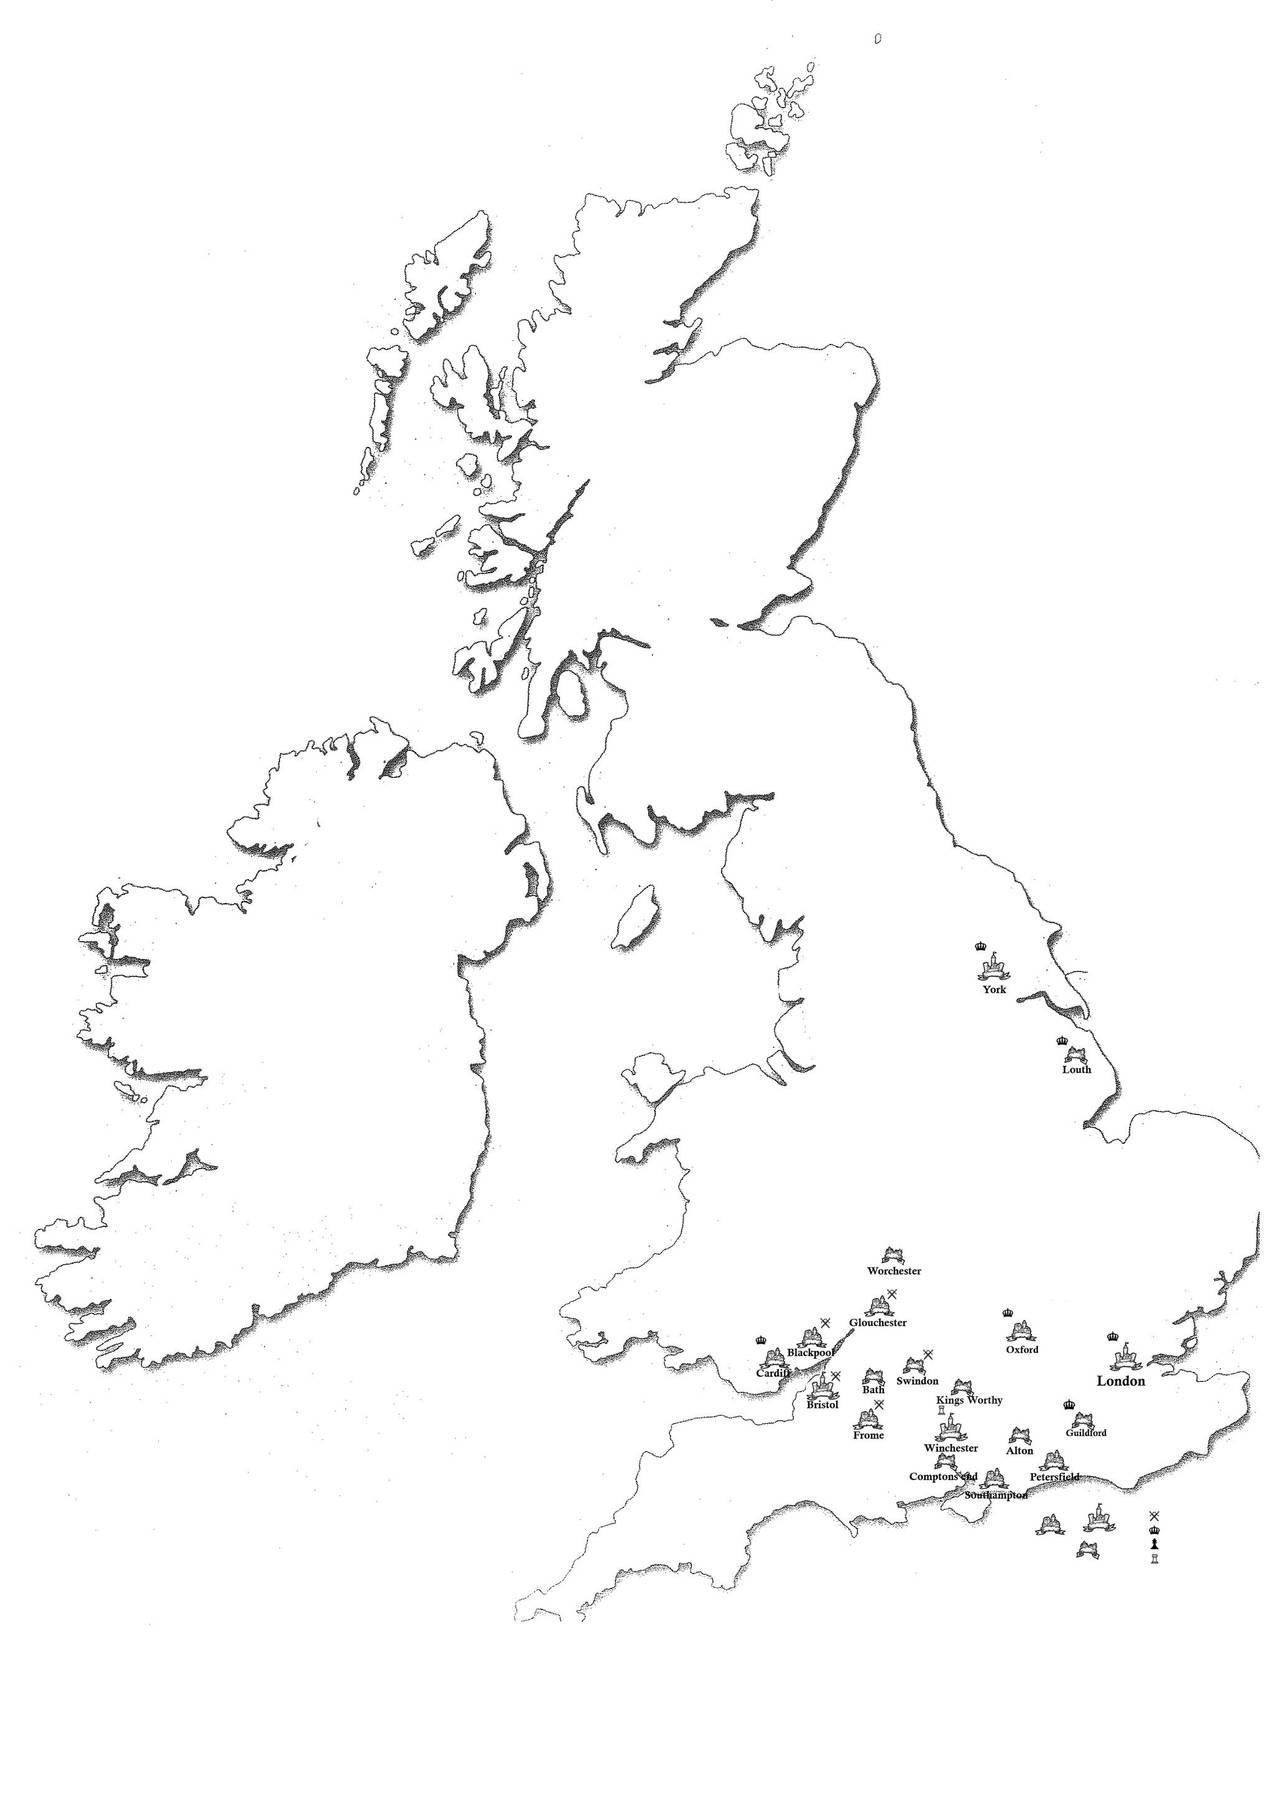 Blank Outline Map Of British Isles | www.tollebild.com